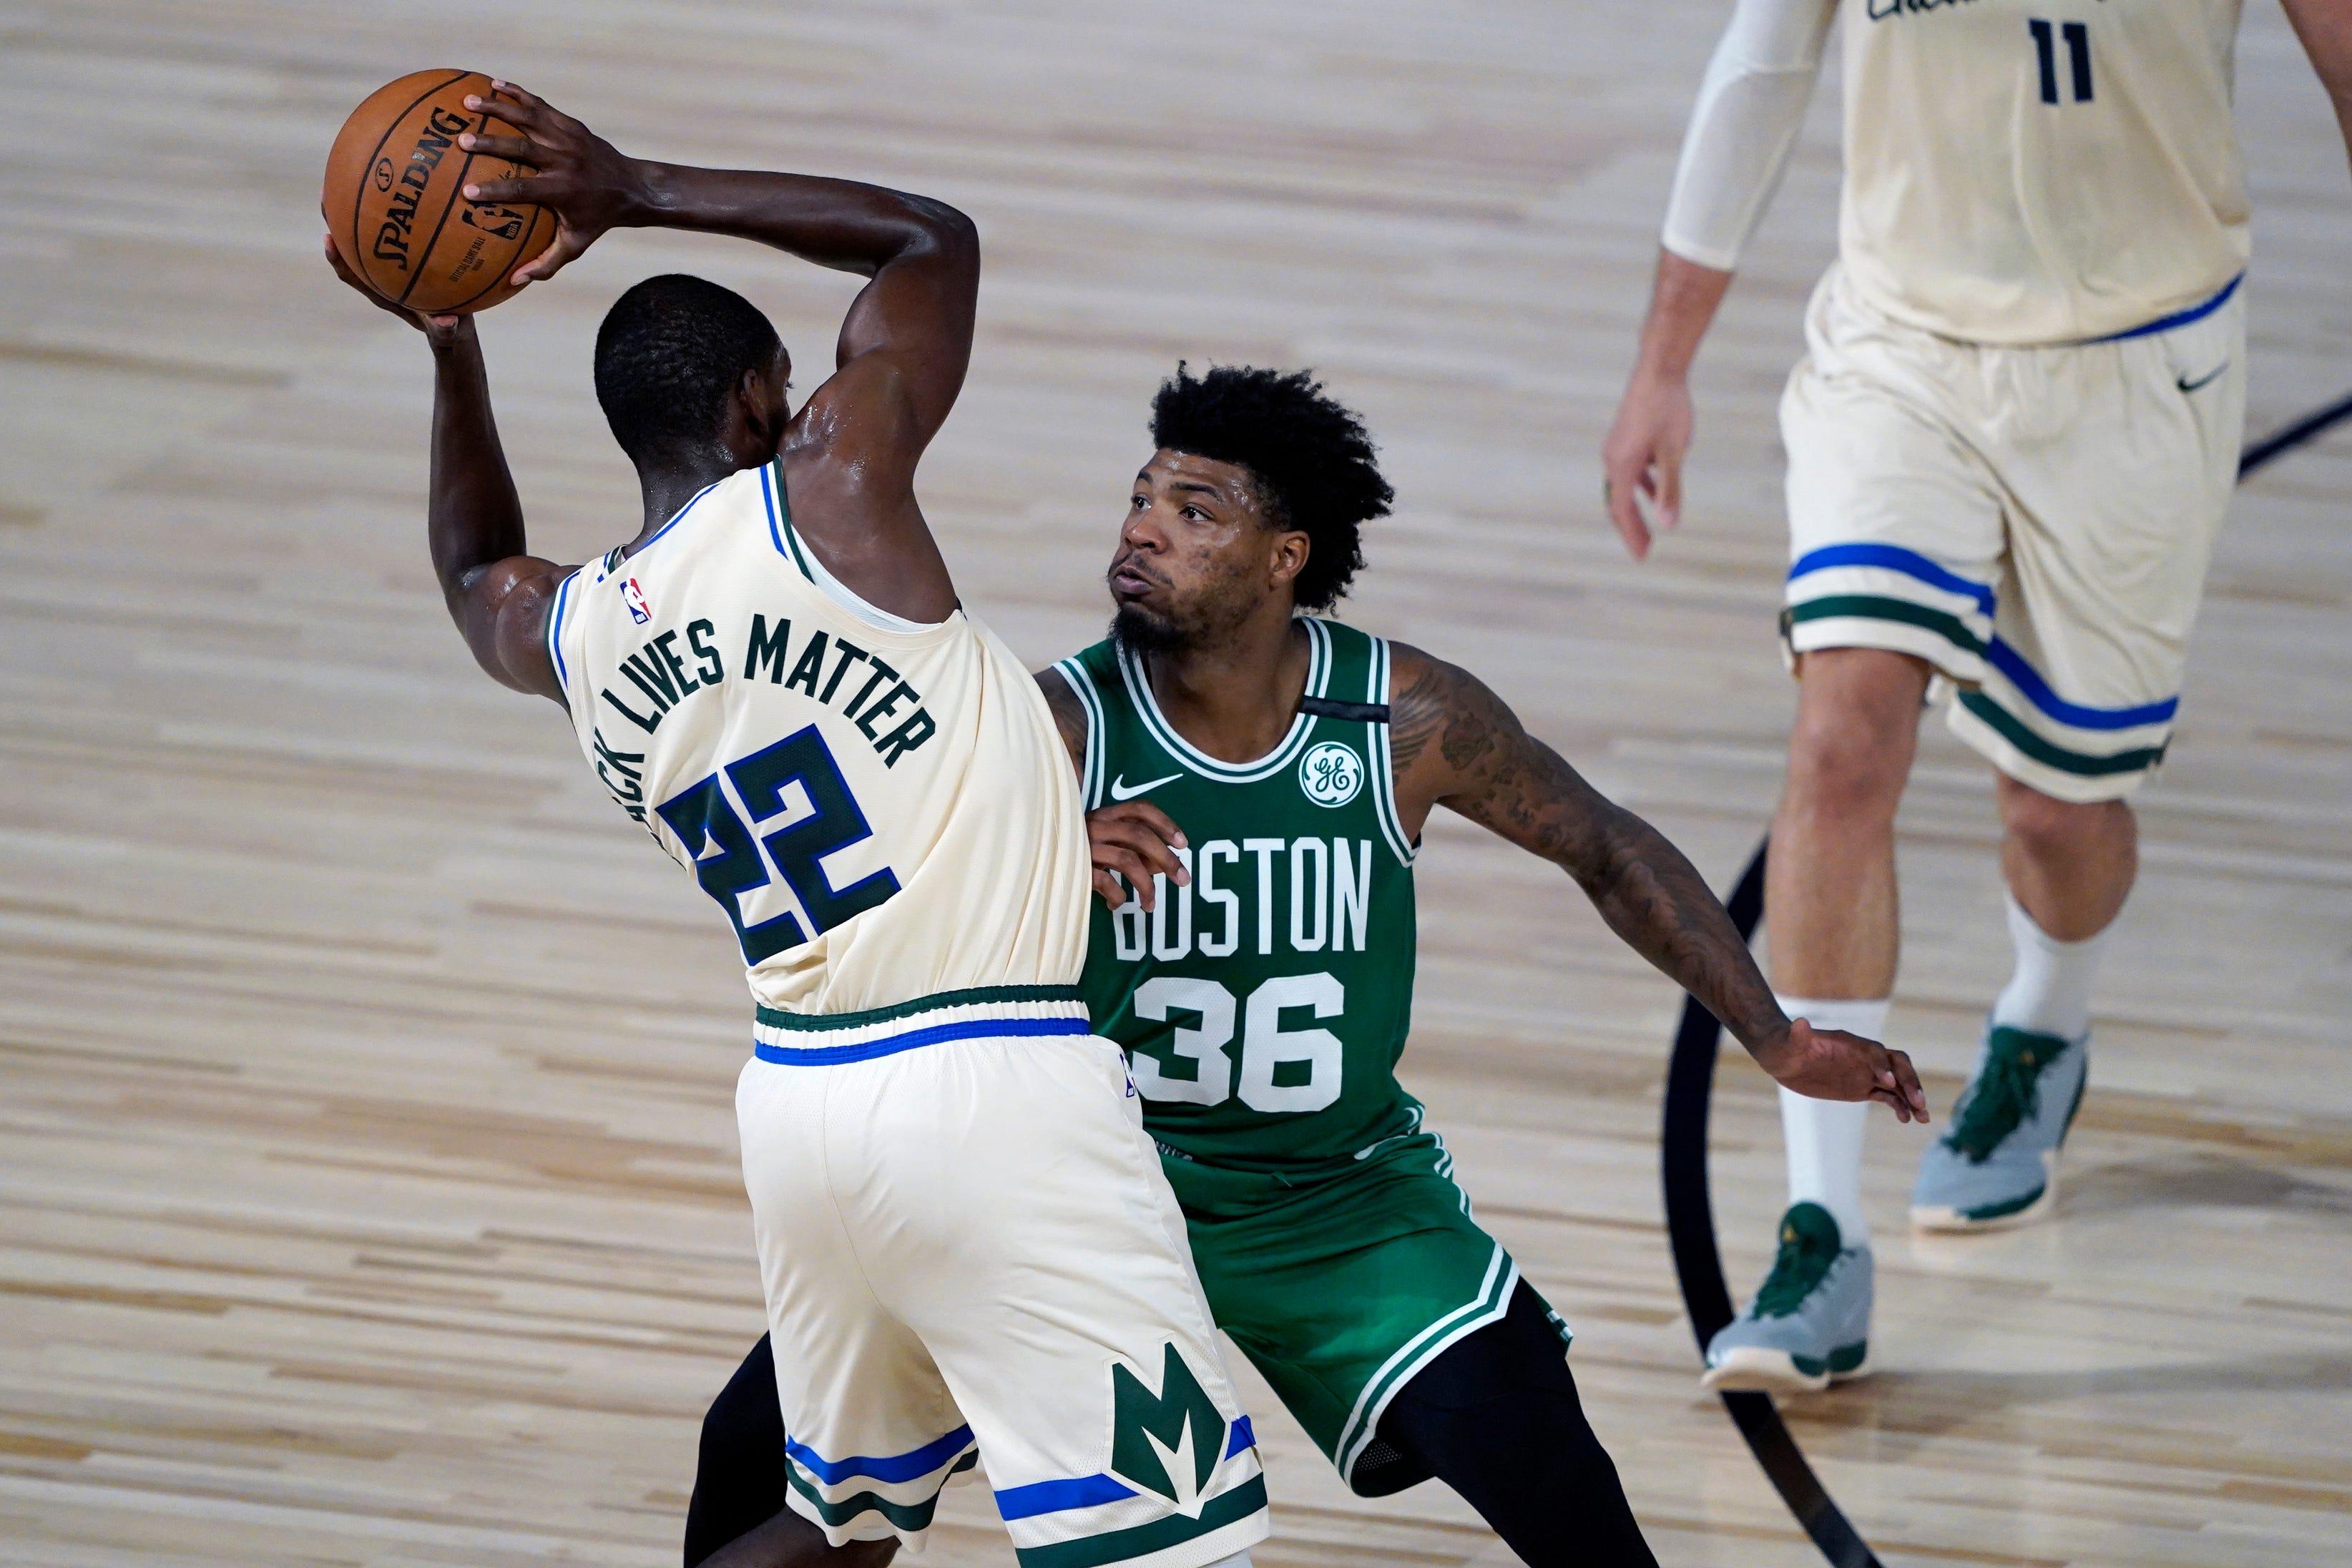 The Celtics' Marcus Smart closely guards the Bucks' Khris Middleton.